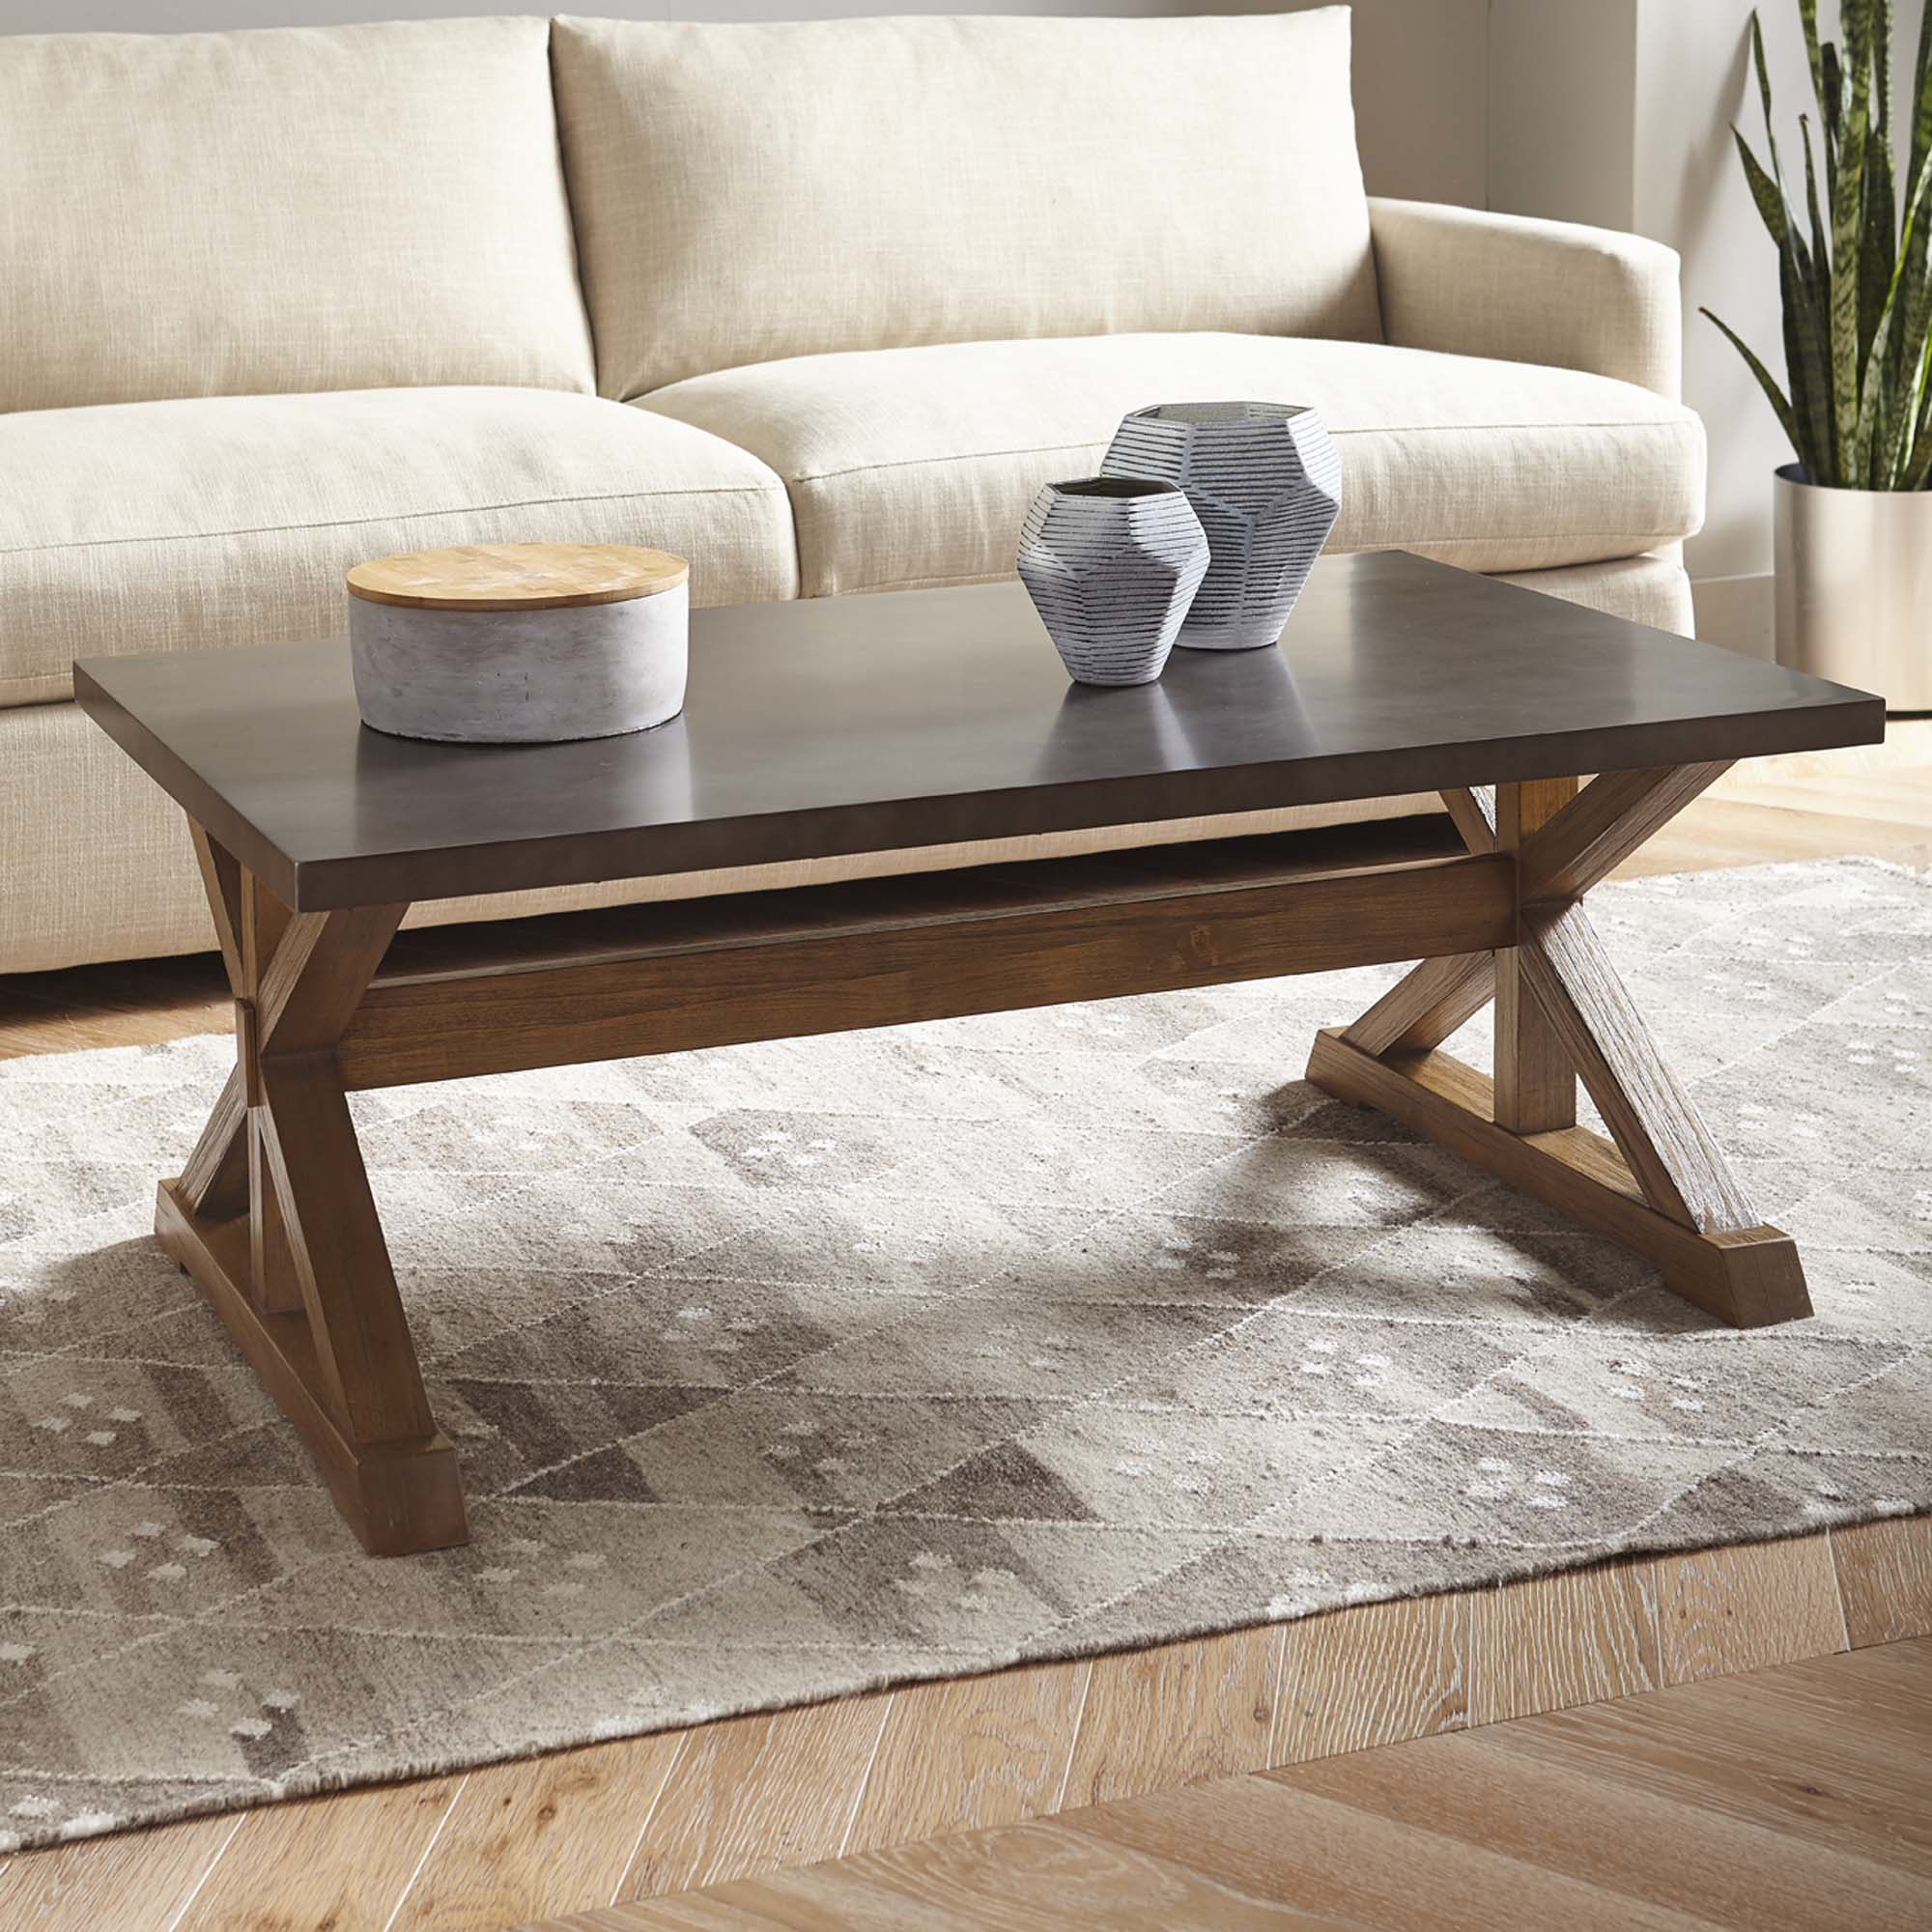 Brayden Studio Reg Maverick Coffee Table Coffee Table Furniture Traditional Furniture [ 2000 x 2000 Pixel ]